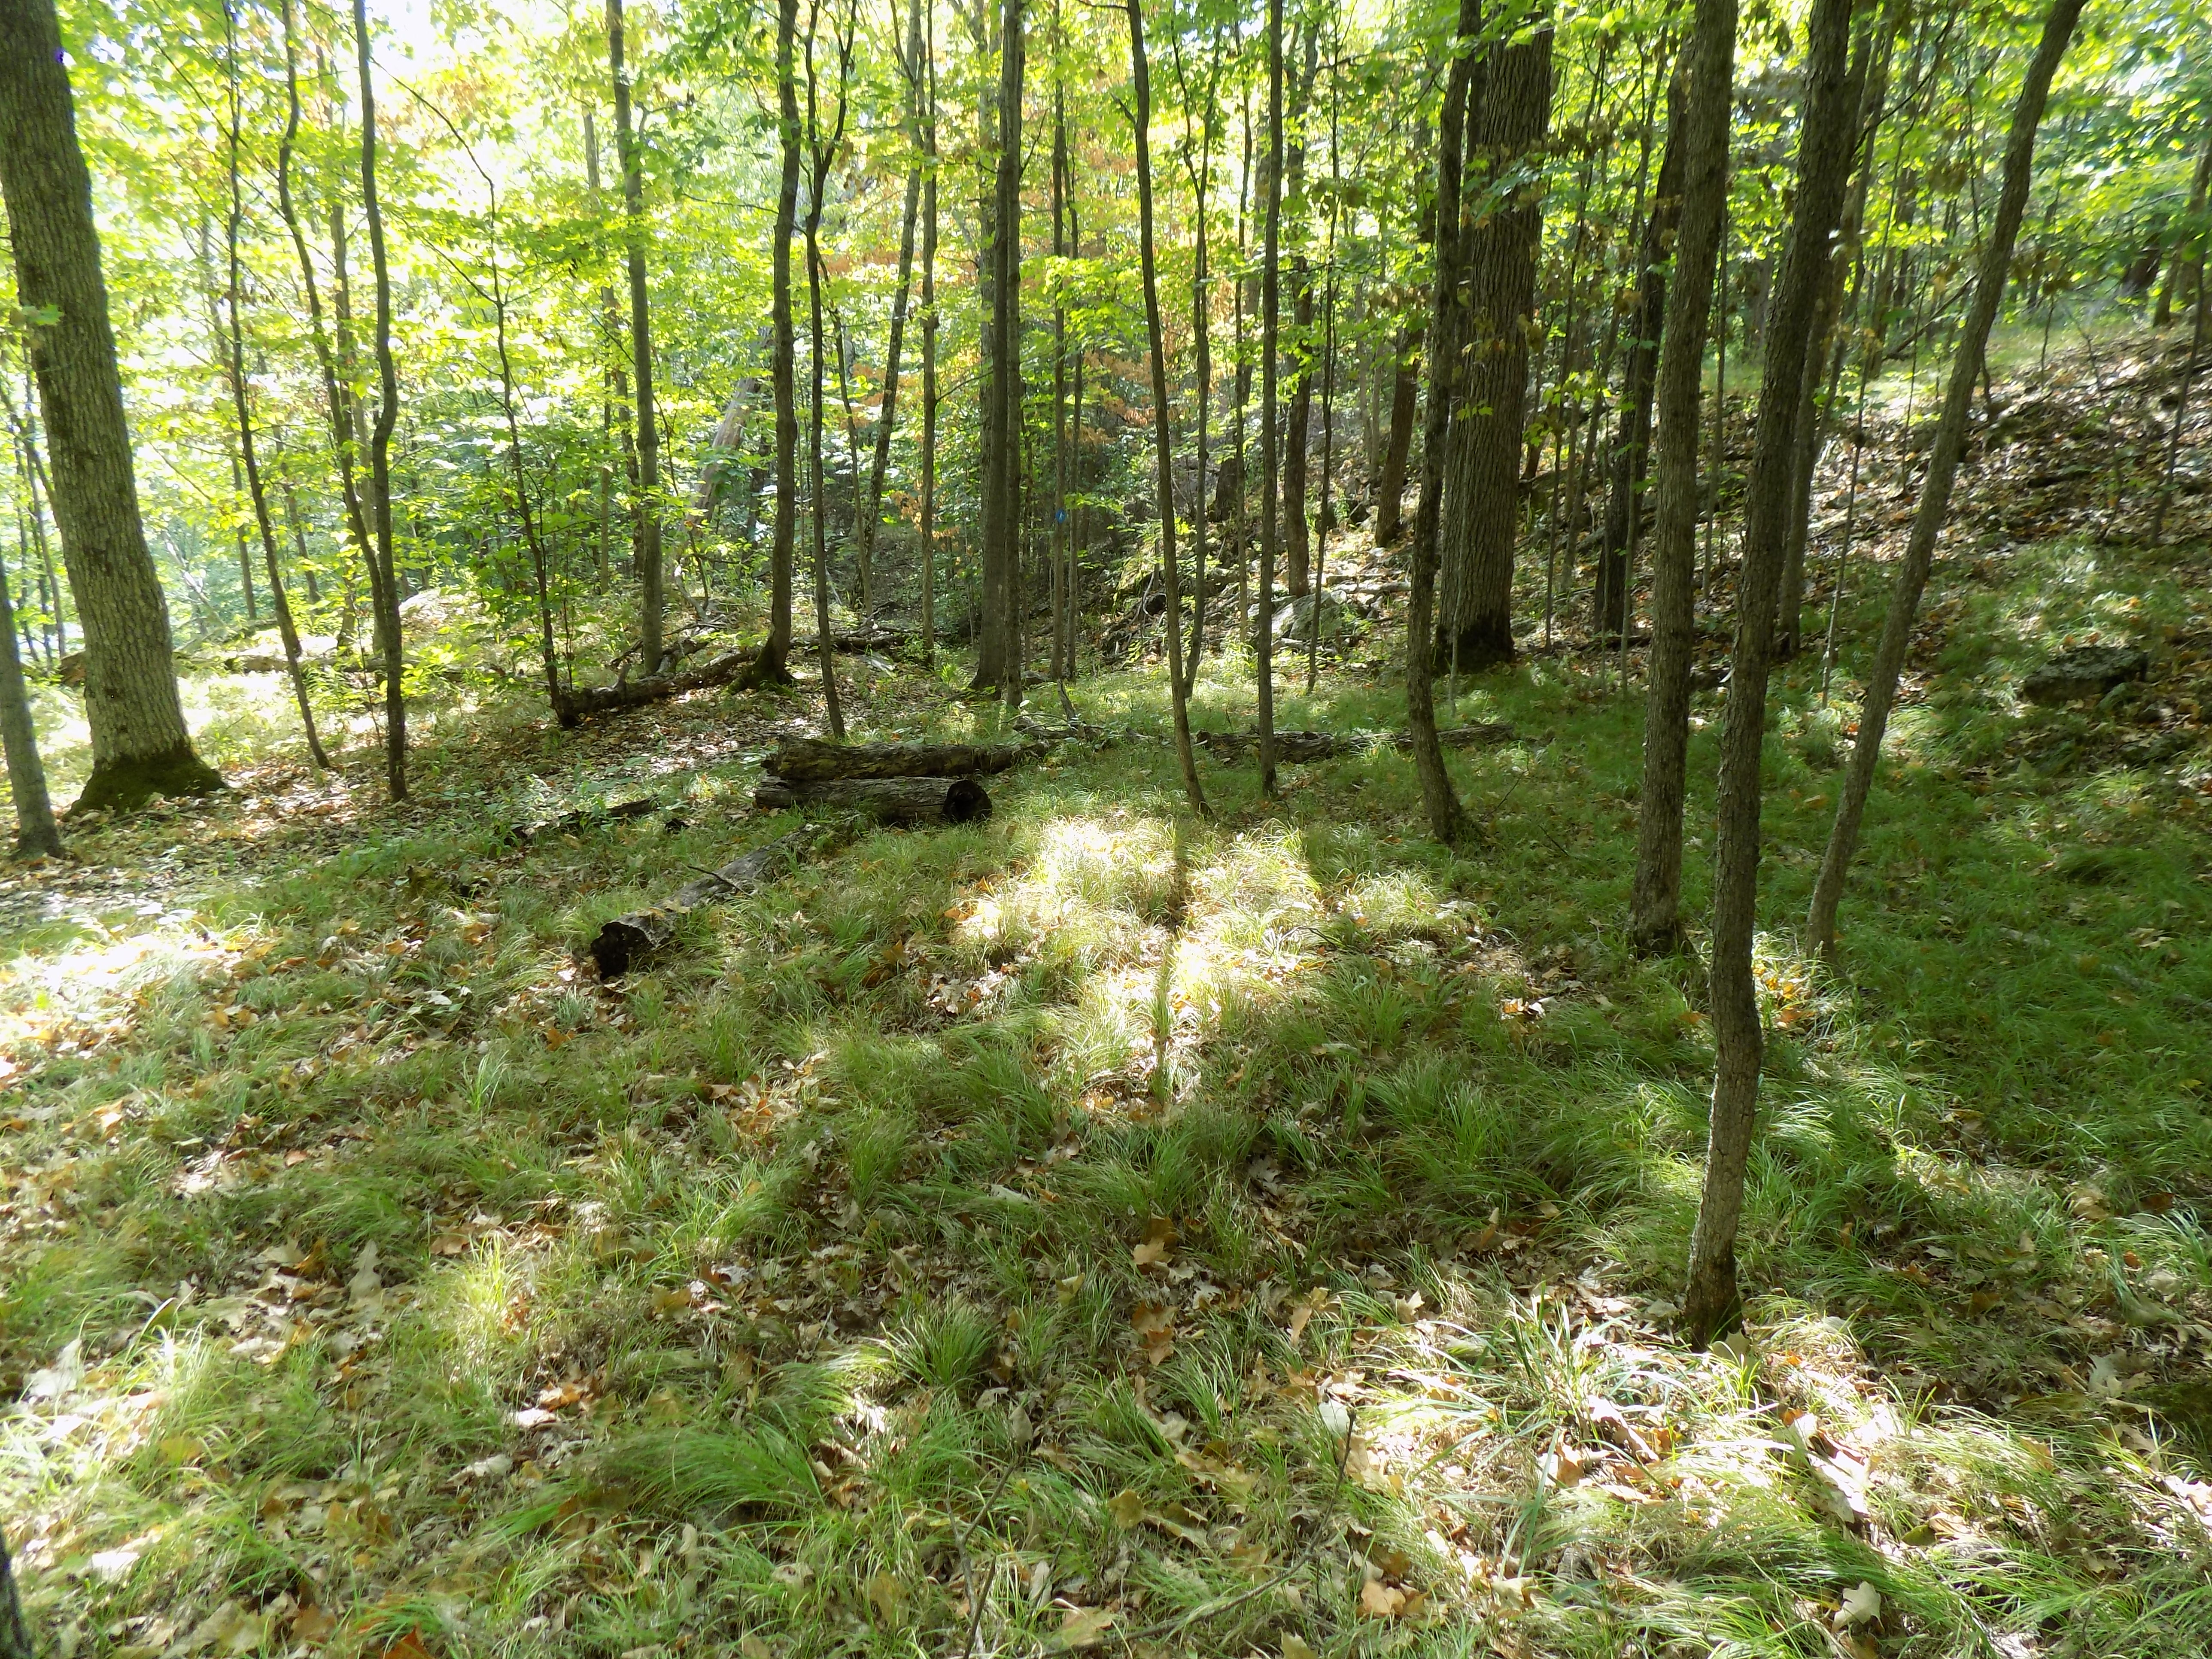 Ontario S Frontenac Provincial Park A Keystone In The